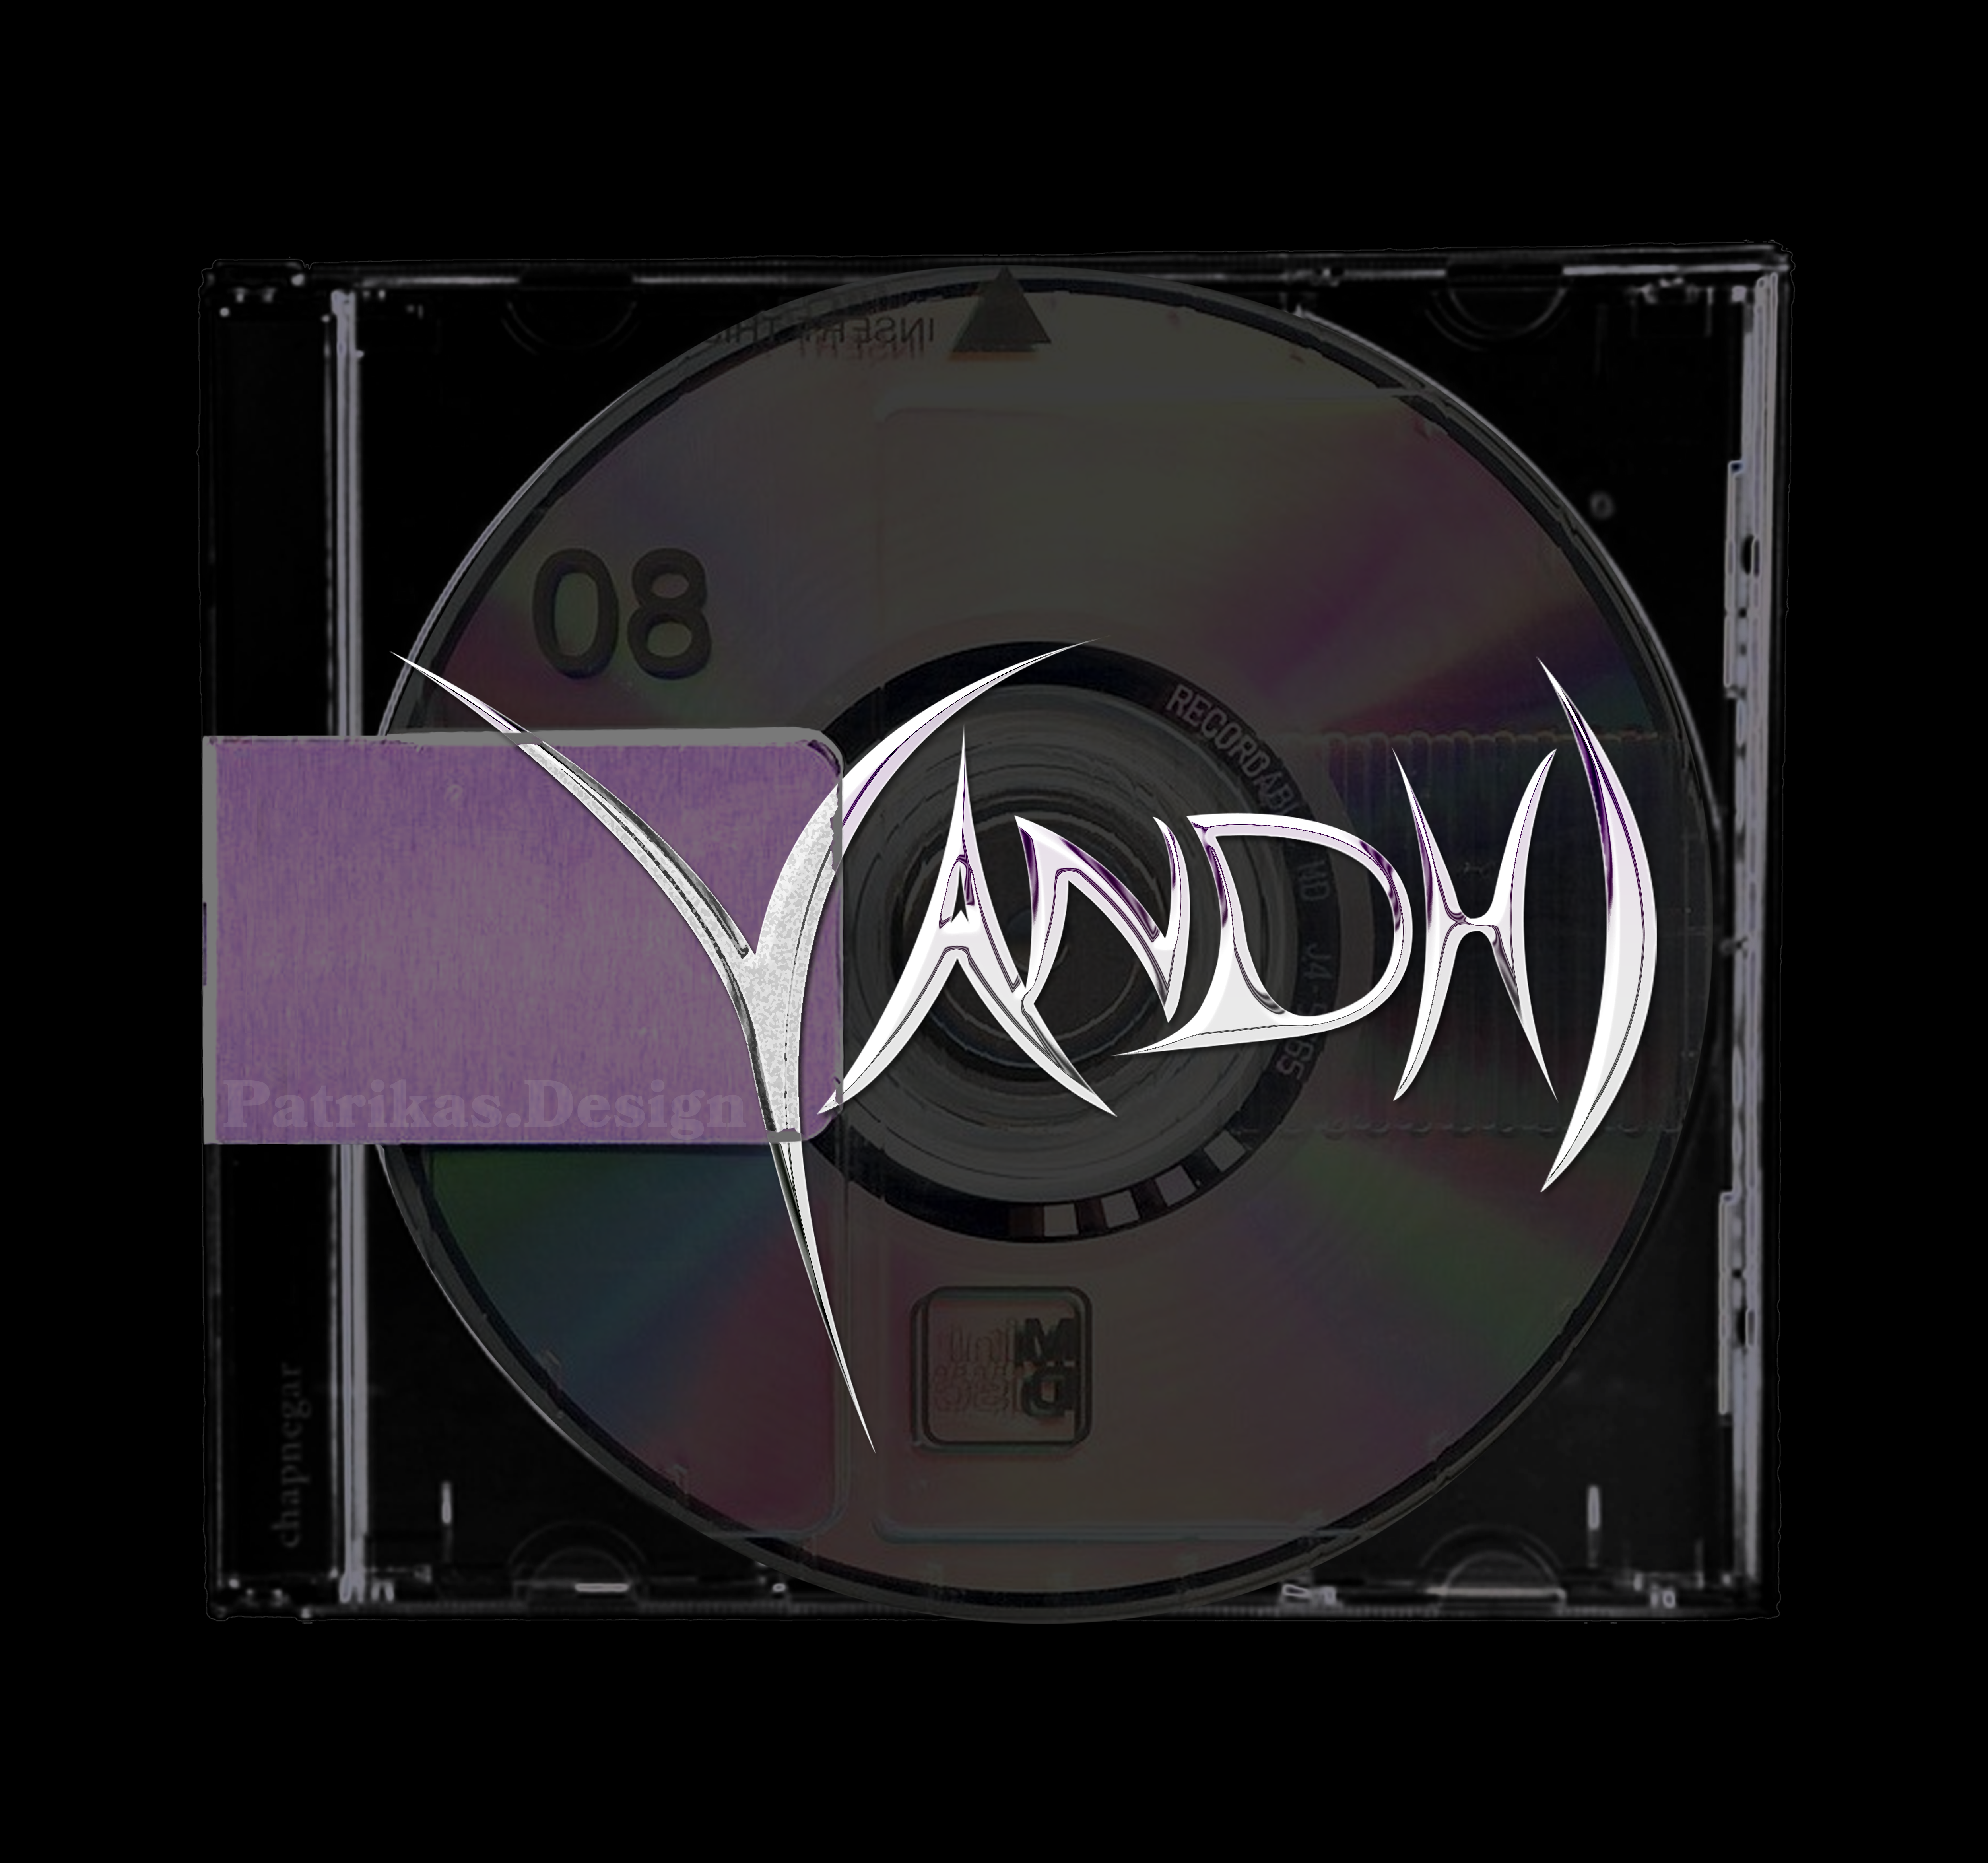 I Remade Kanye West S Yandhi Album Cover Kanye West Albums Album Covers Kanye West